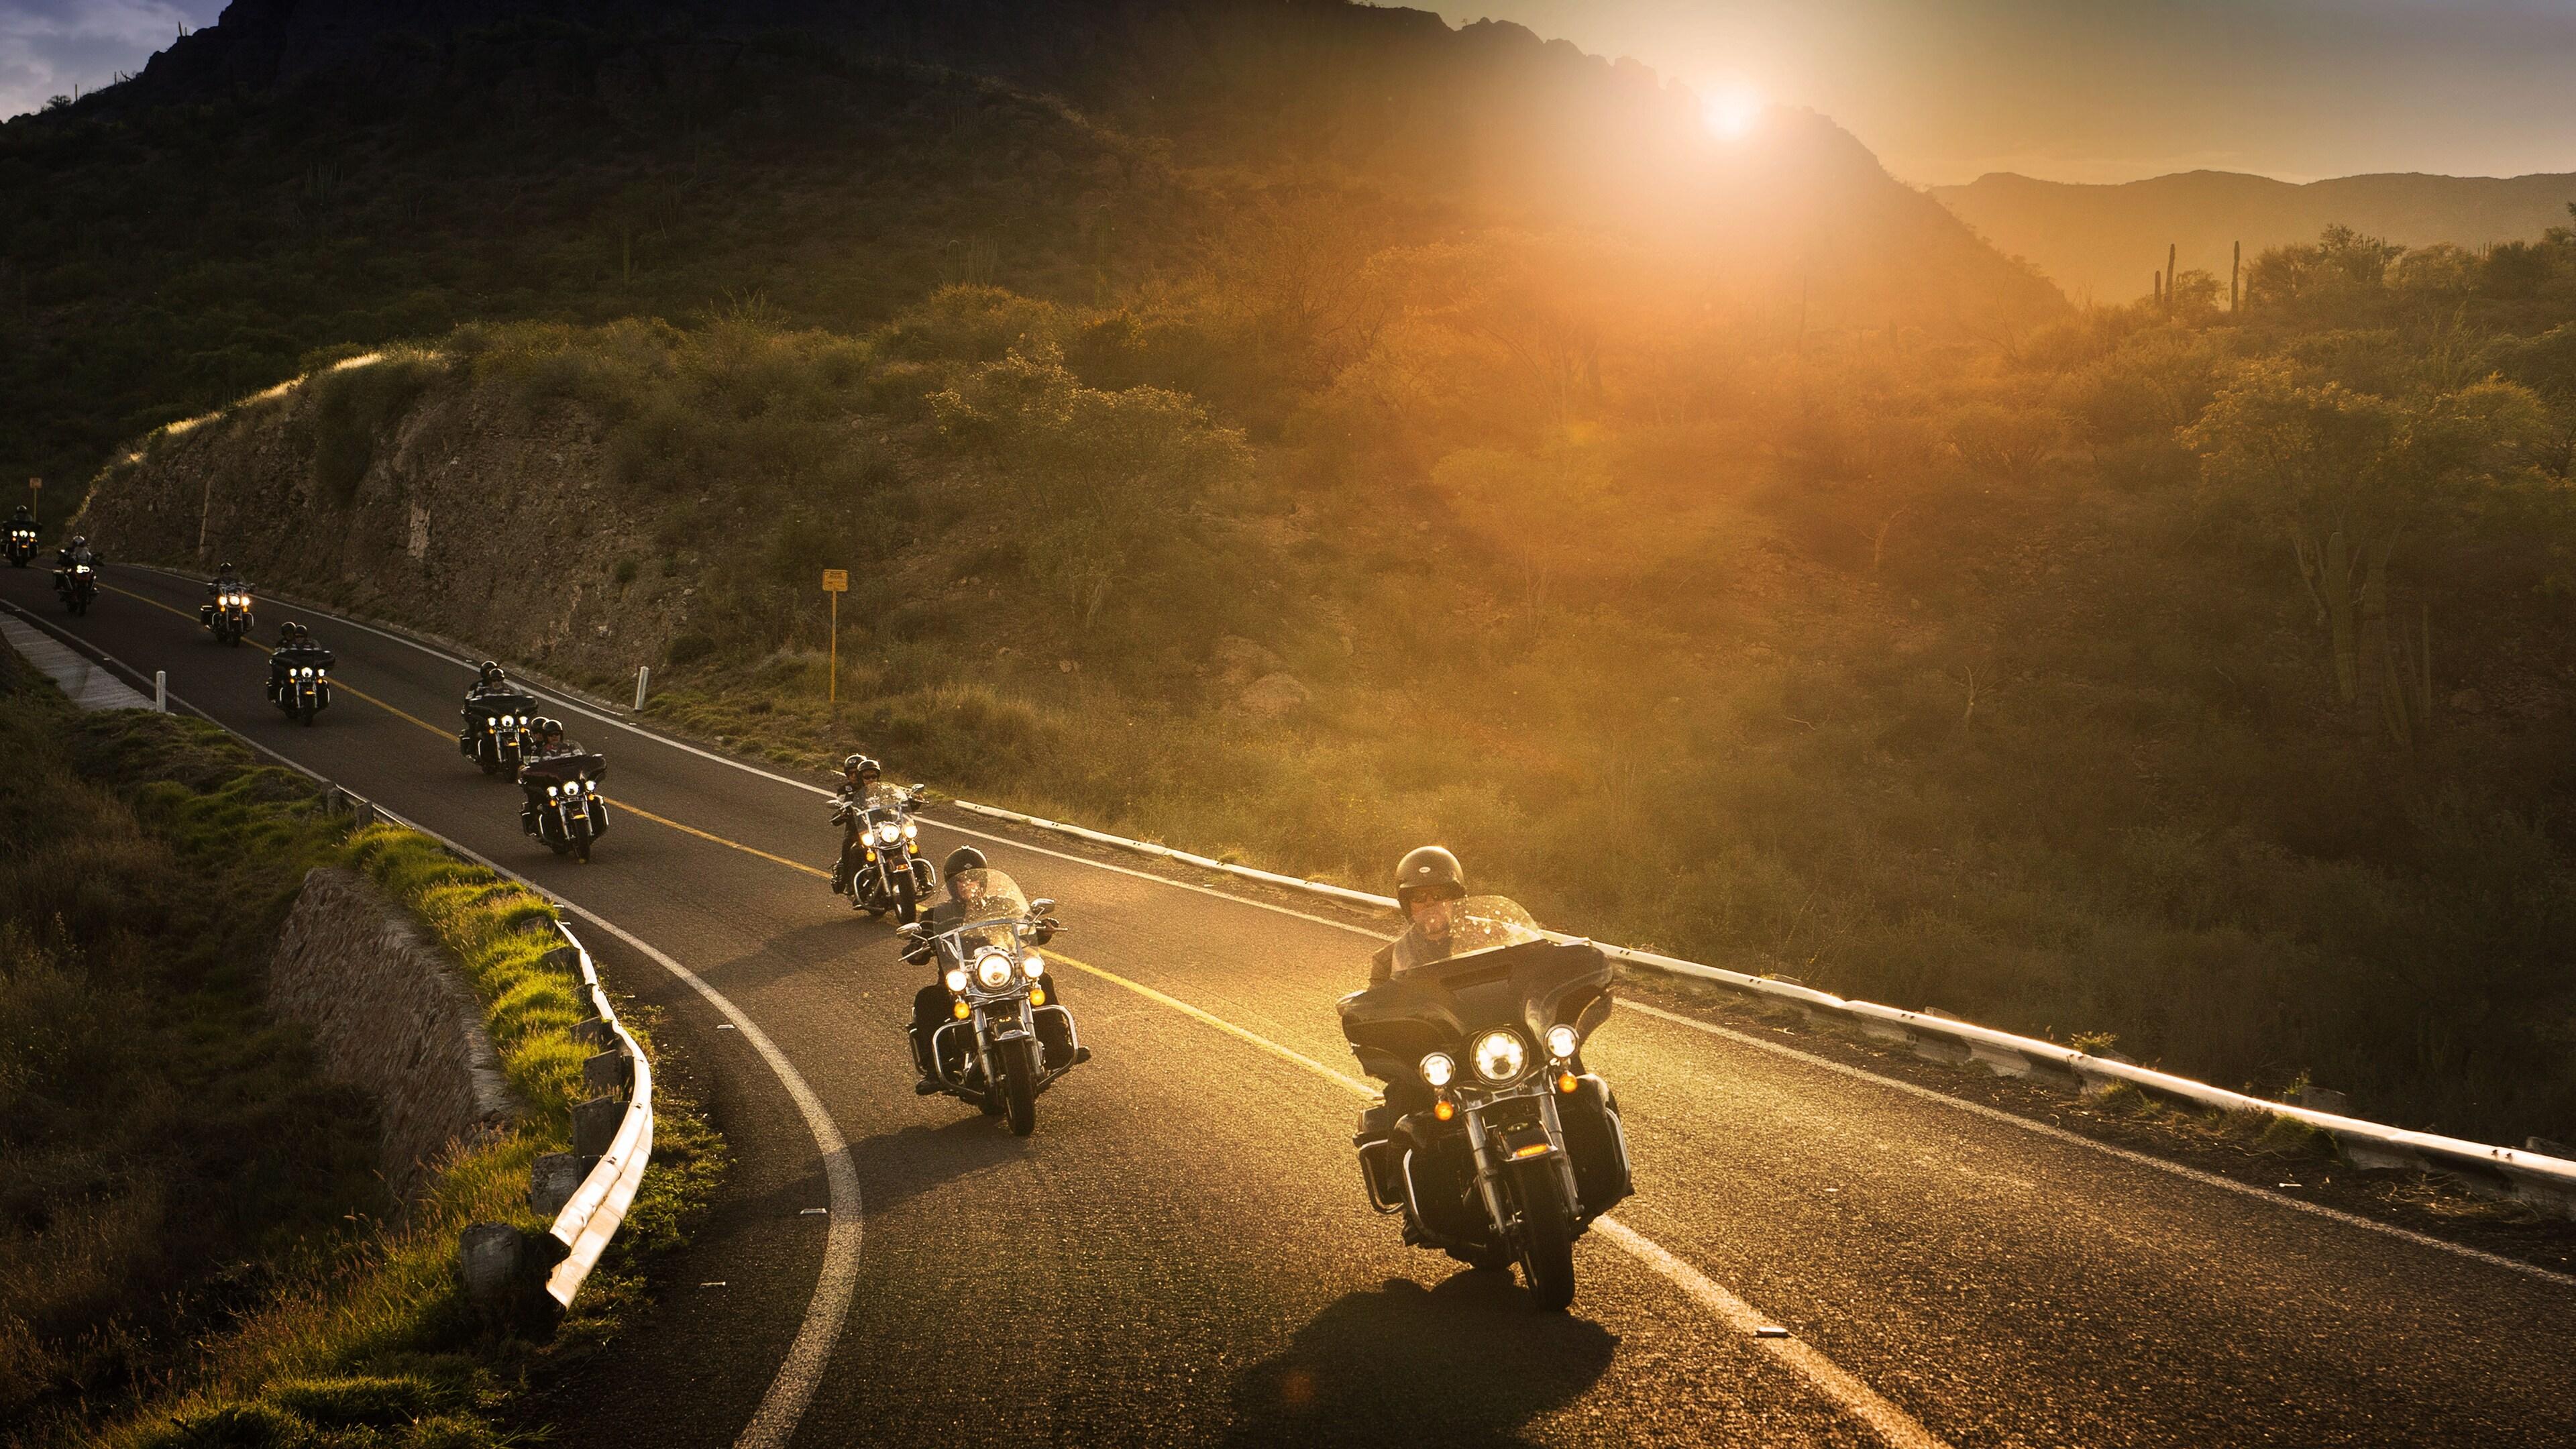 3840x2160 Harley Davidson Riders 8k 4k HD 4k Wallpapers